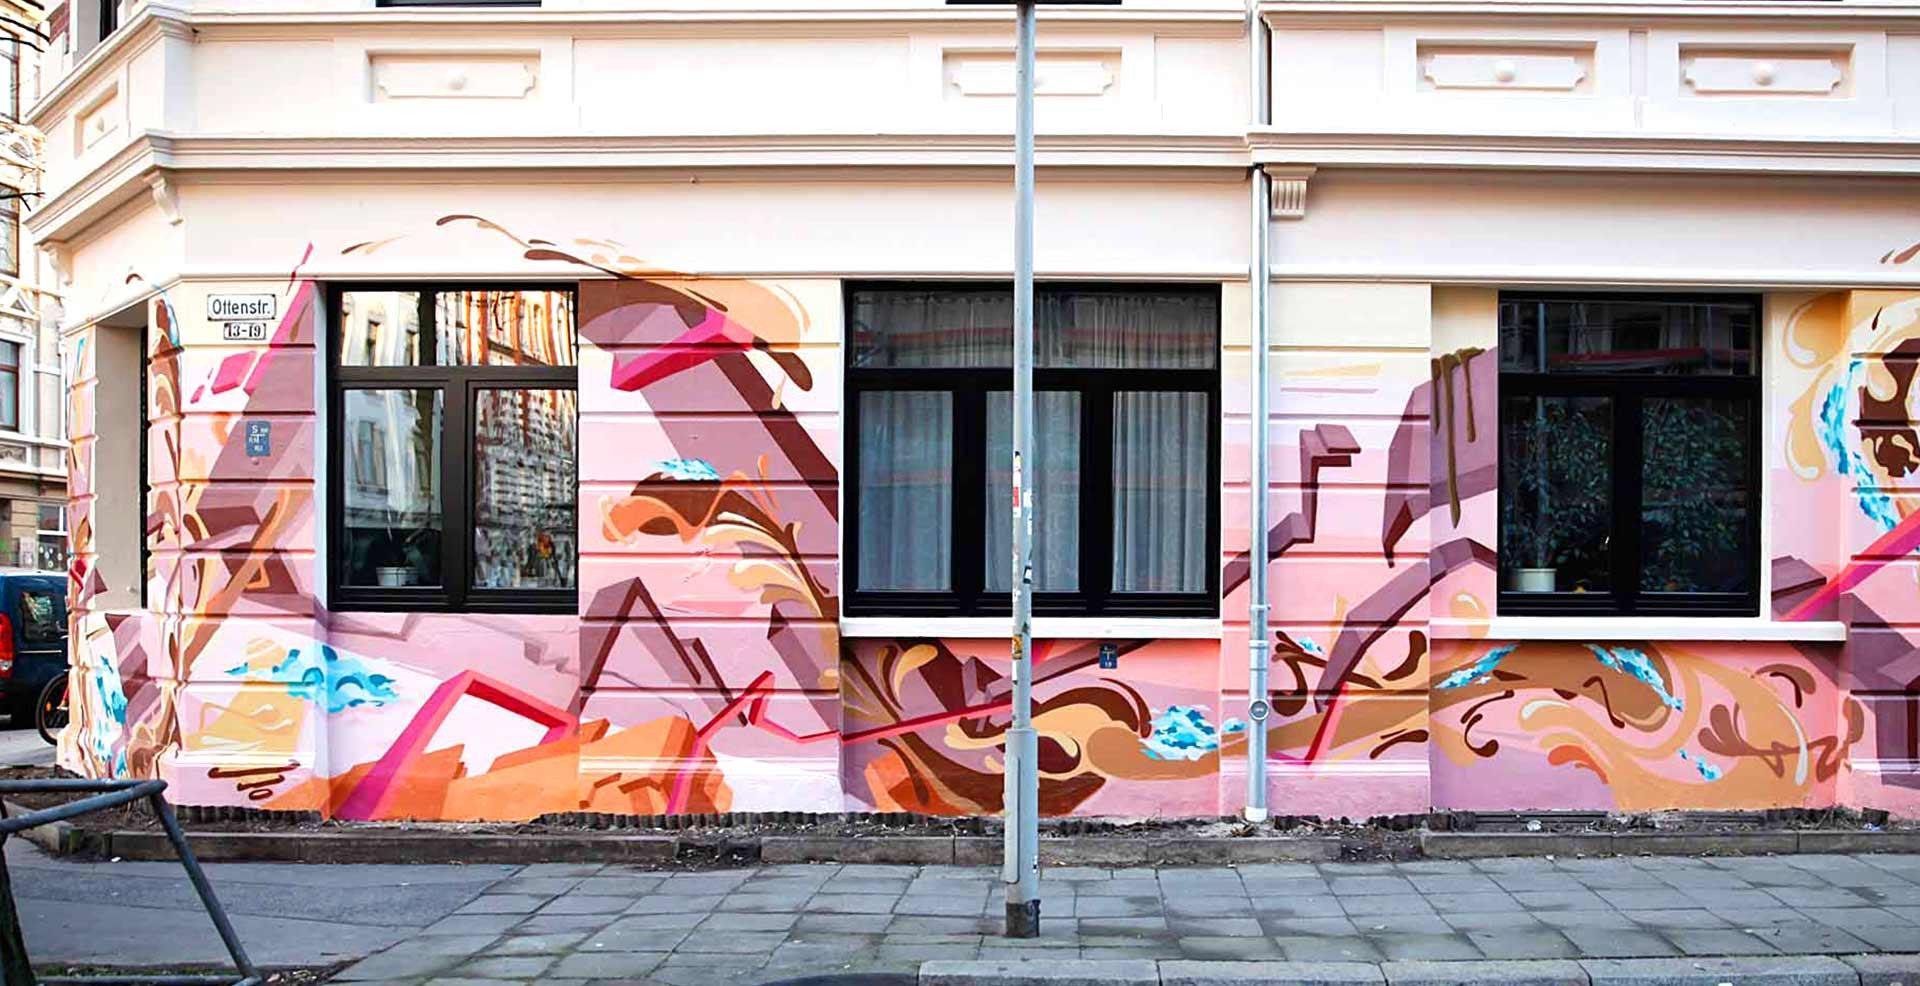 3D Graffiti Design in Linden